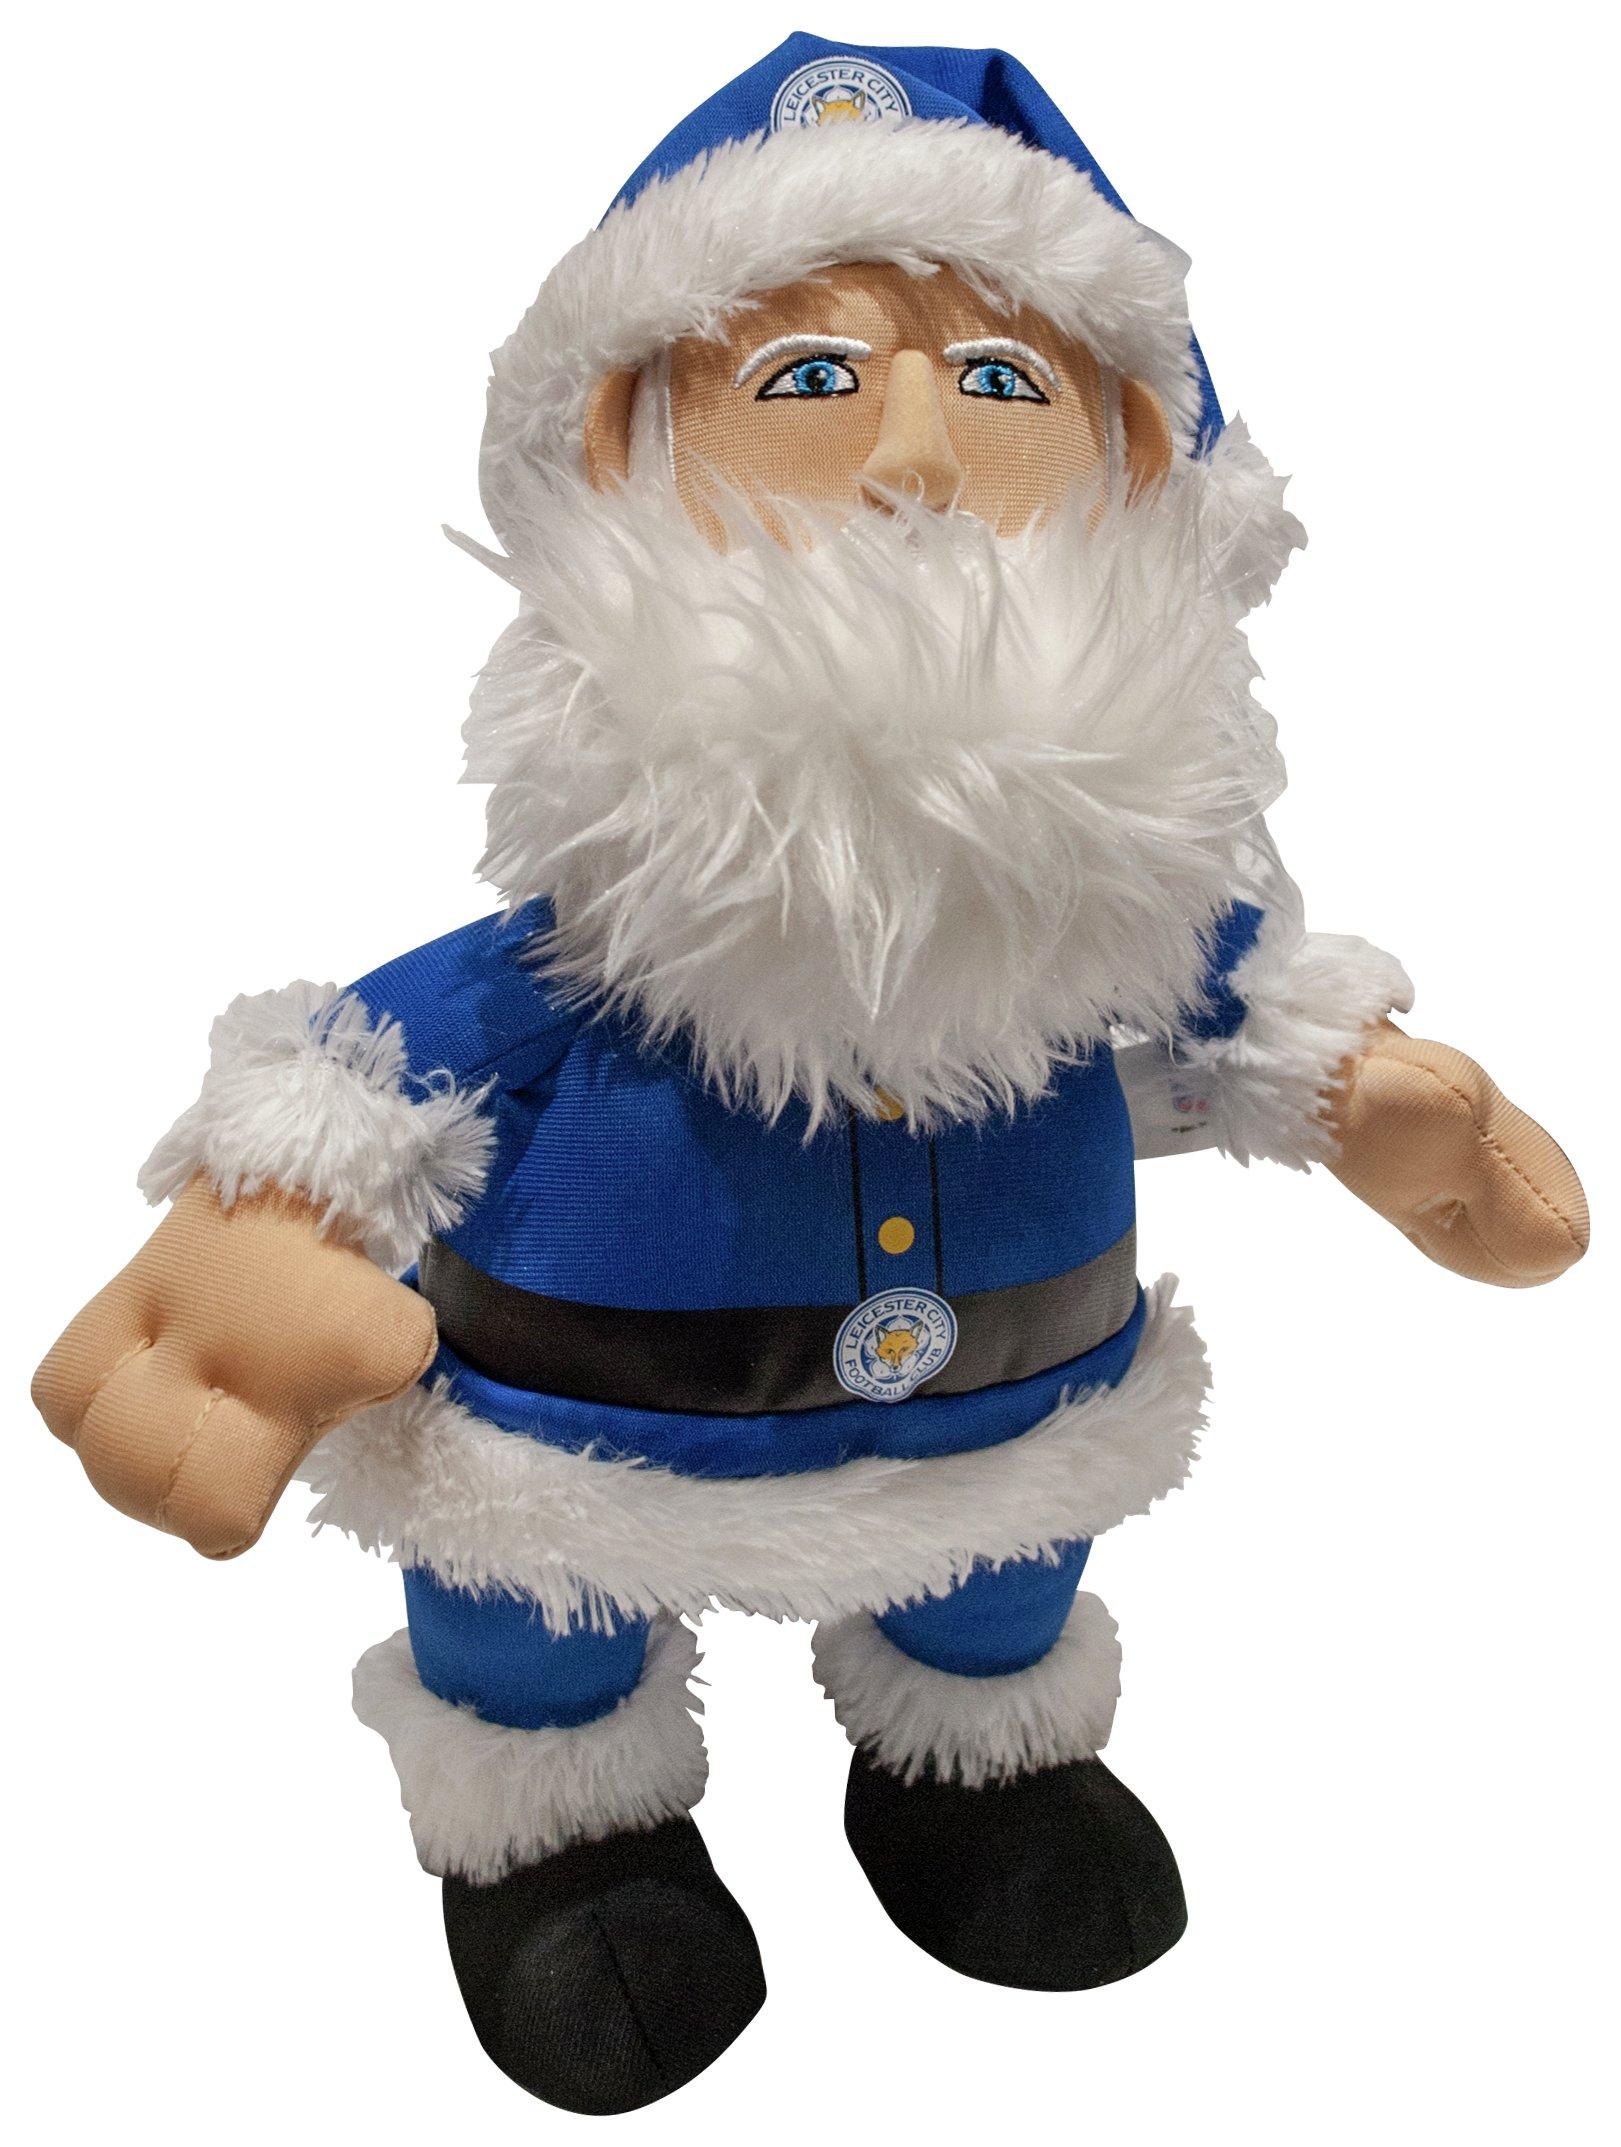 Image of Bleacher Creatures Leicester City FC Santa 10 Inch Plush.